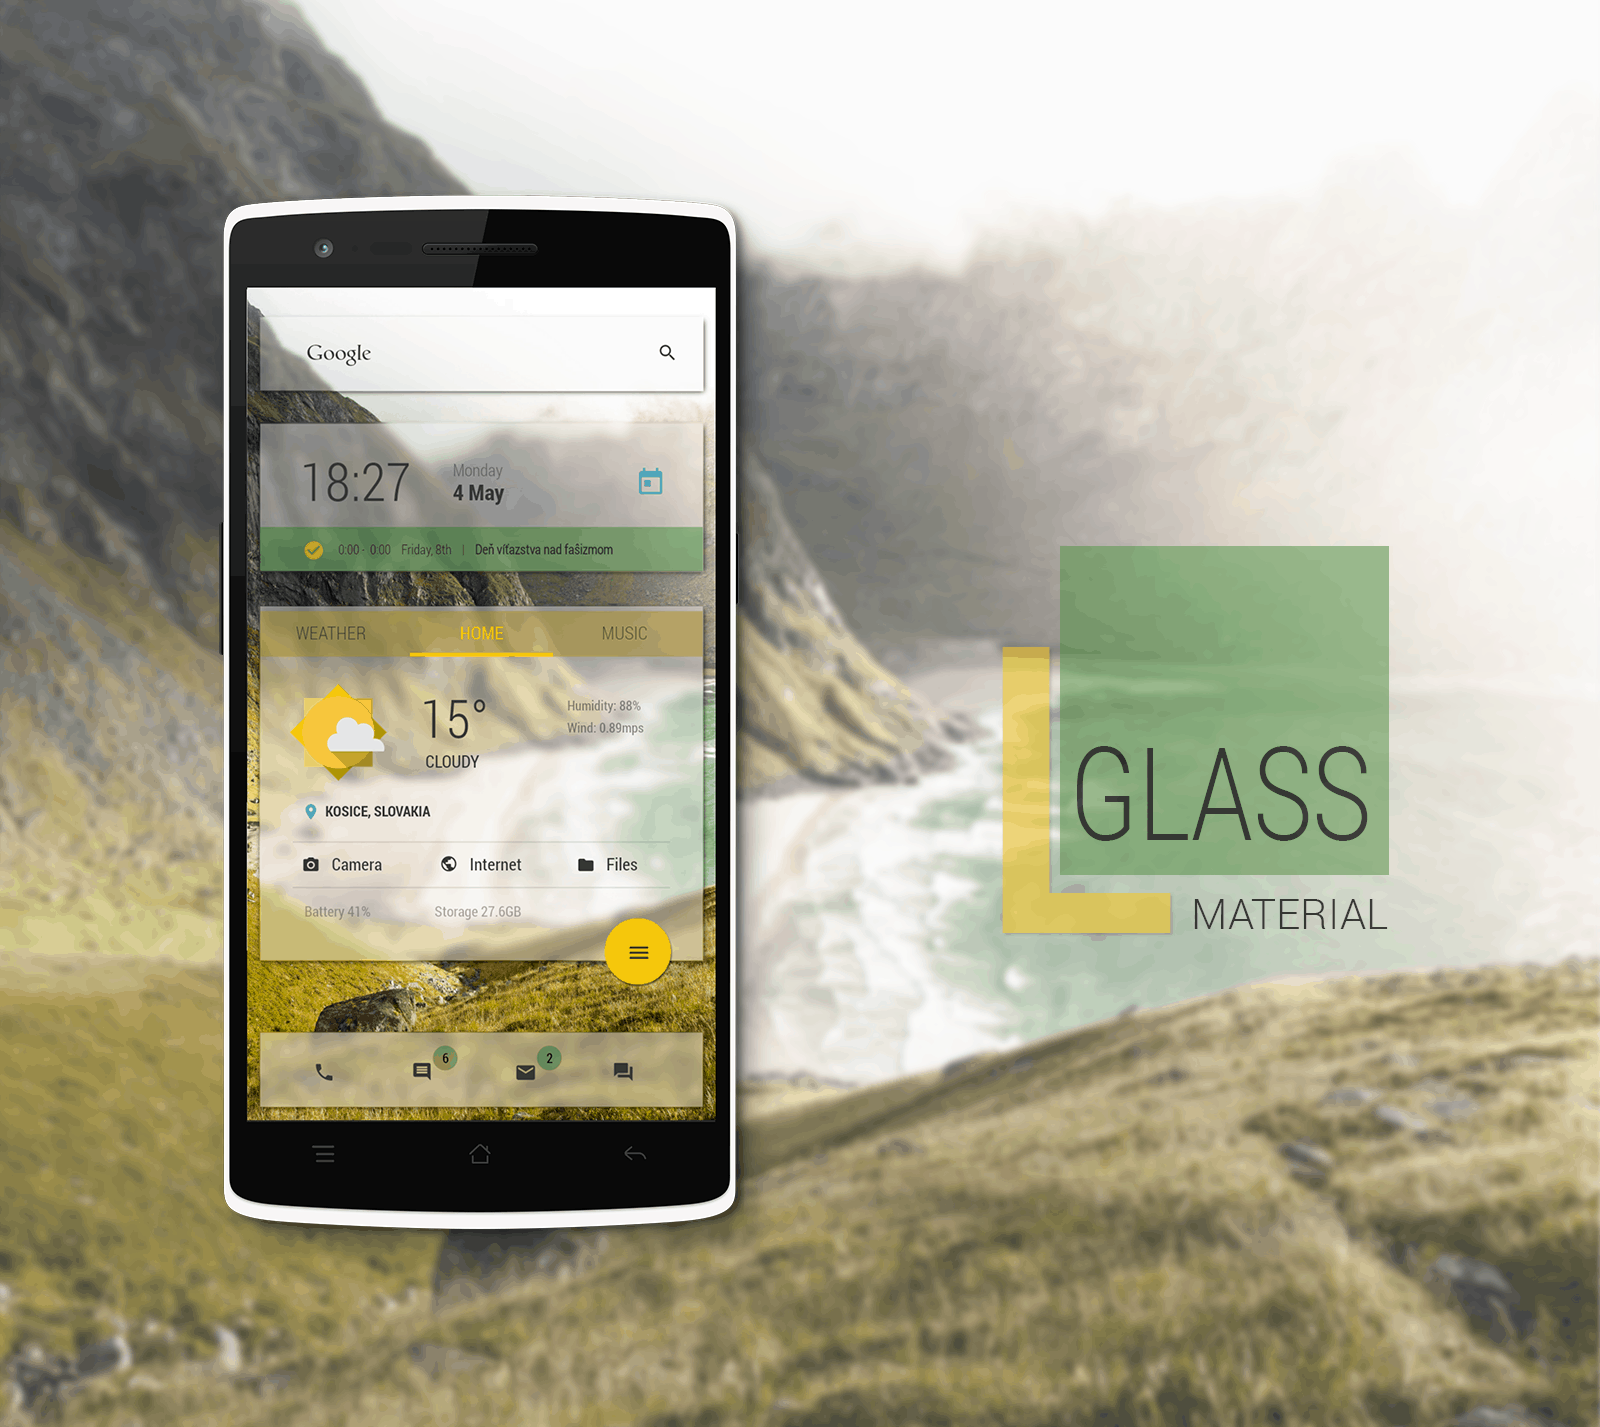 GlassMaterialMain_original